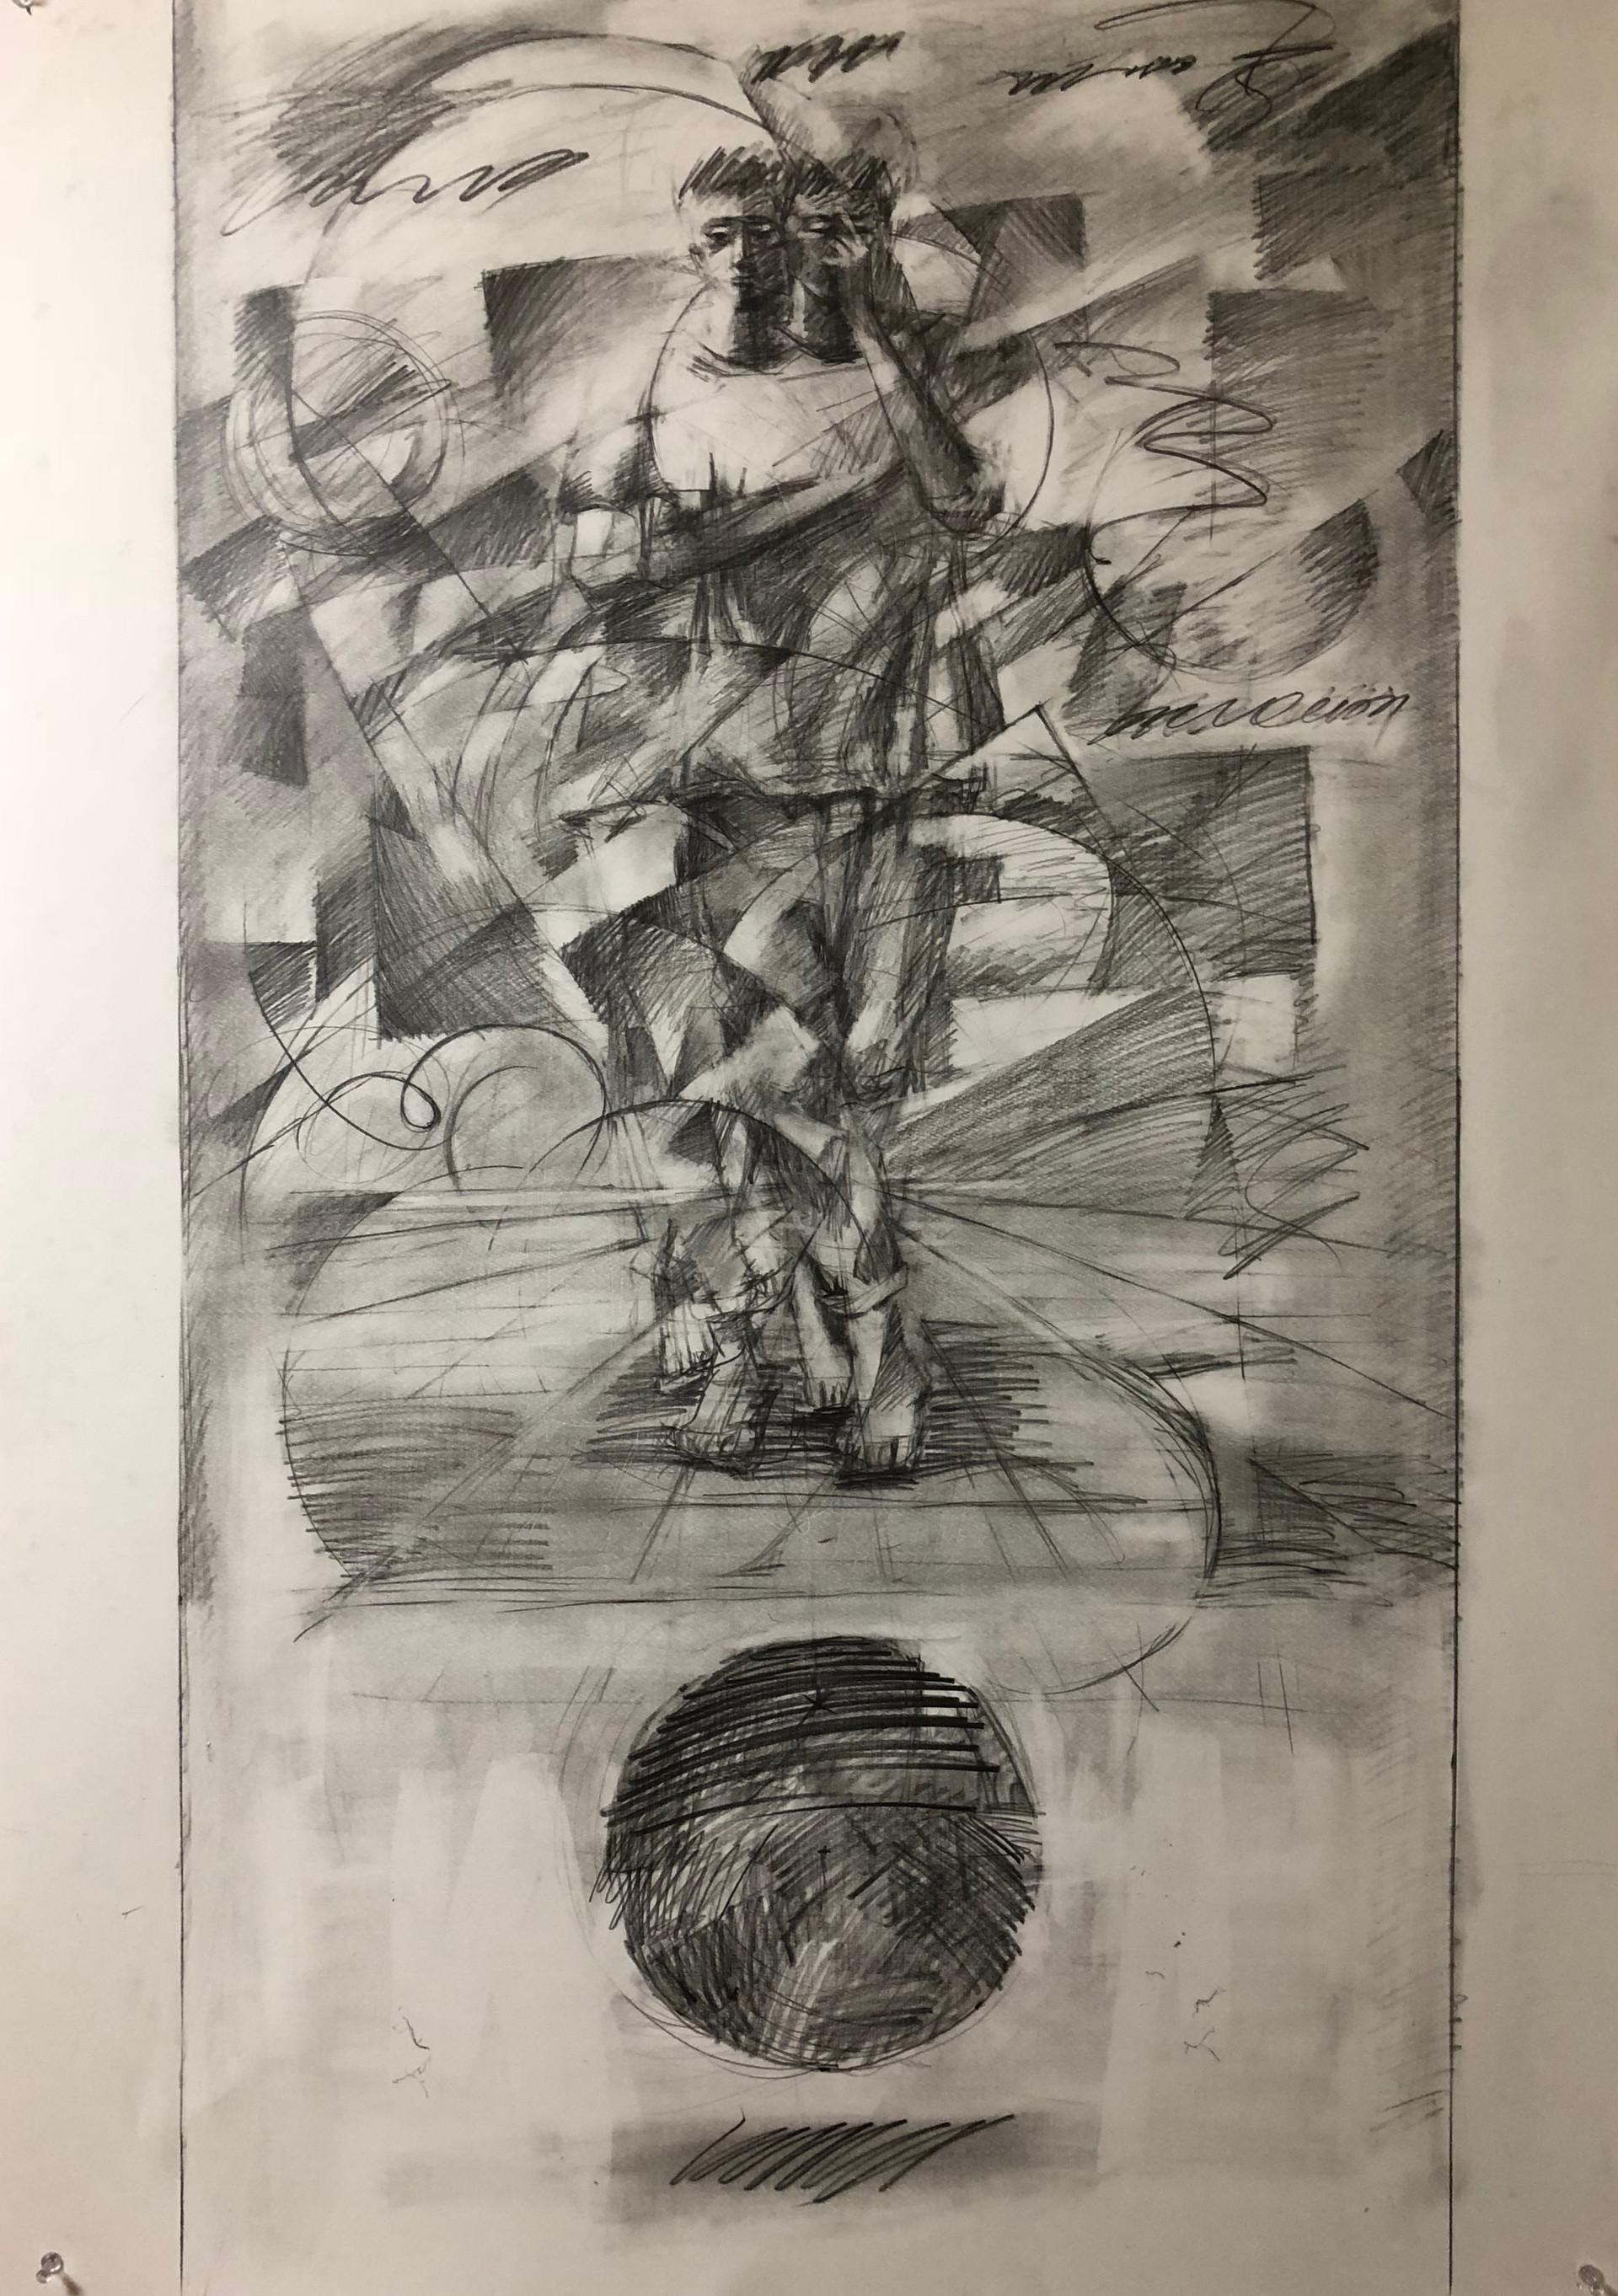 重力2 | 鉛筆、紙 1456mm ☓ 1030mm  | 2018